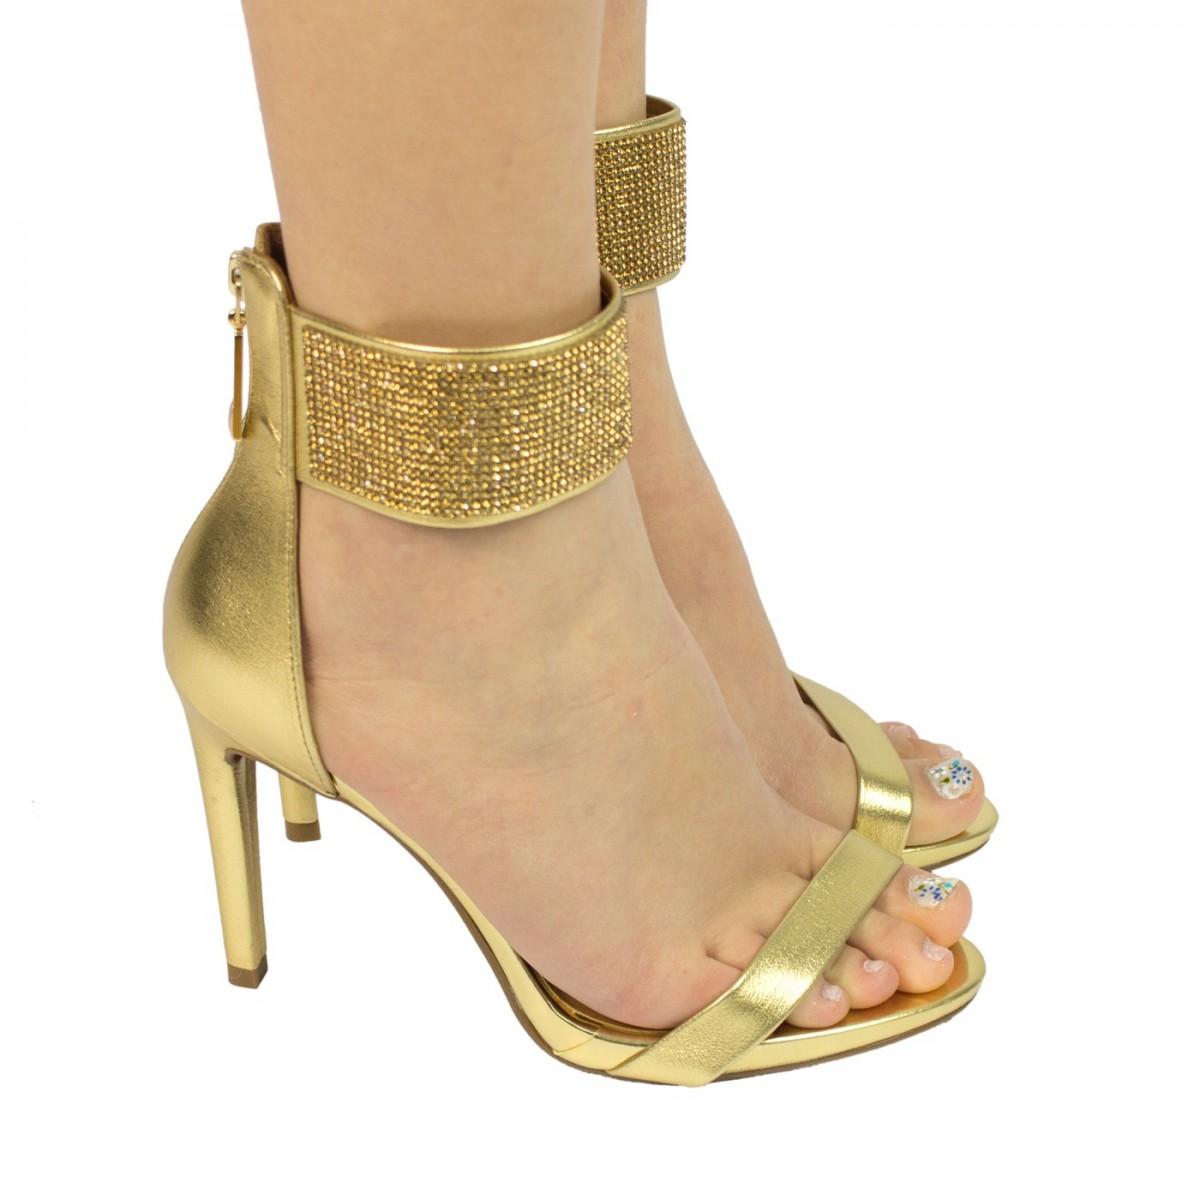 2d84c5138 Bizz Store - Sandália Feminina Vizzano Salto Alto Dourada Glamour